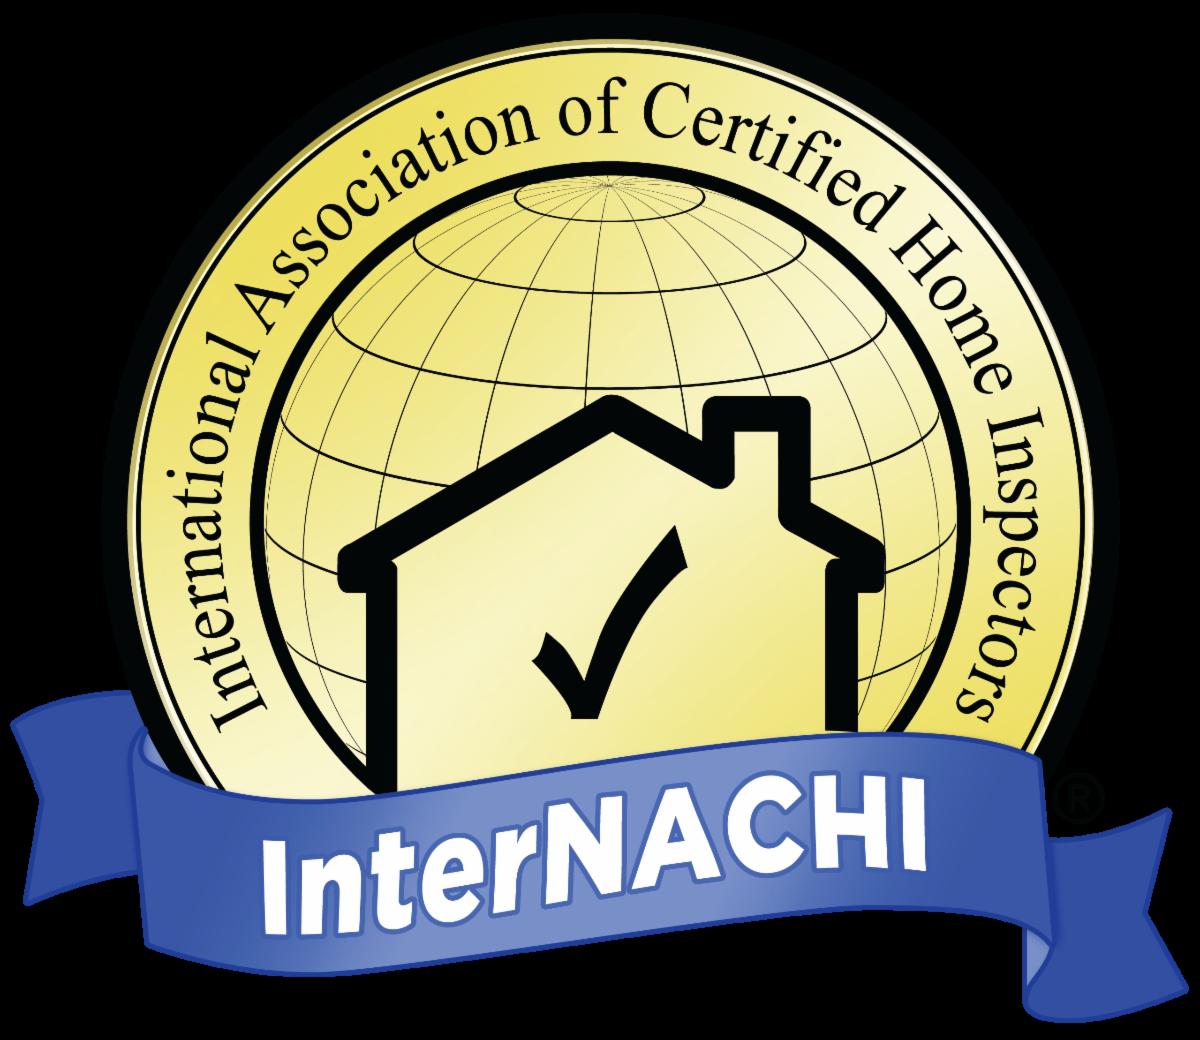 InterNACHI_Logo.png